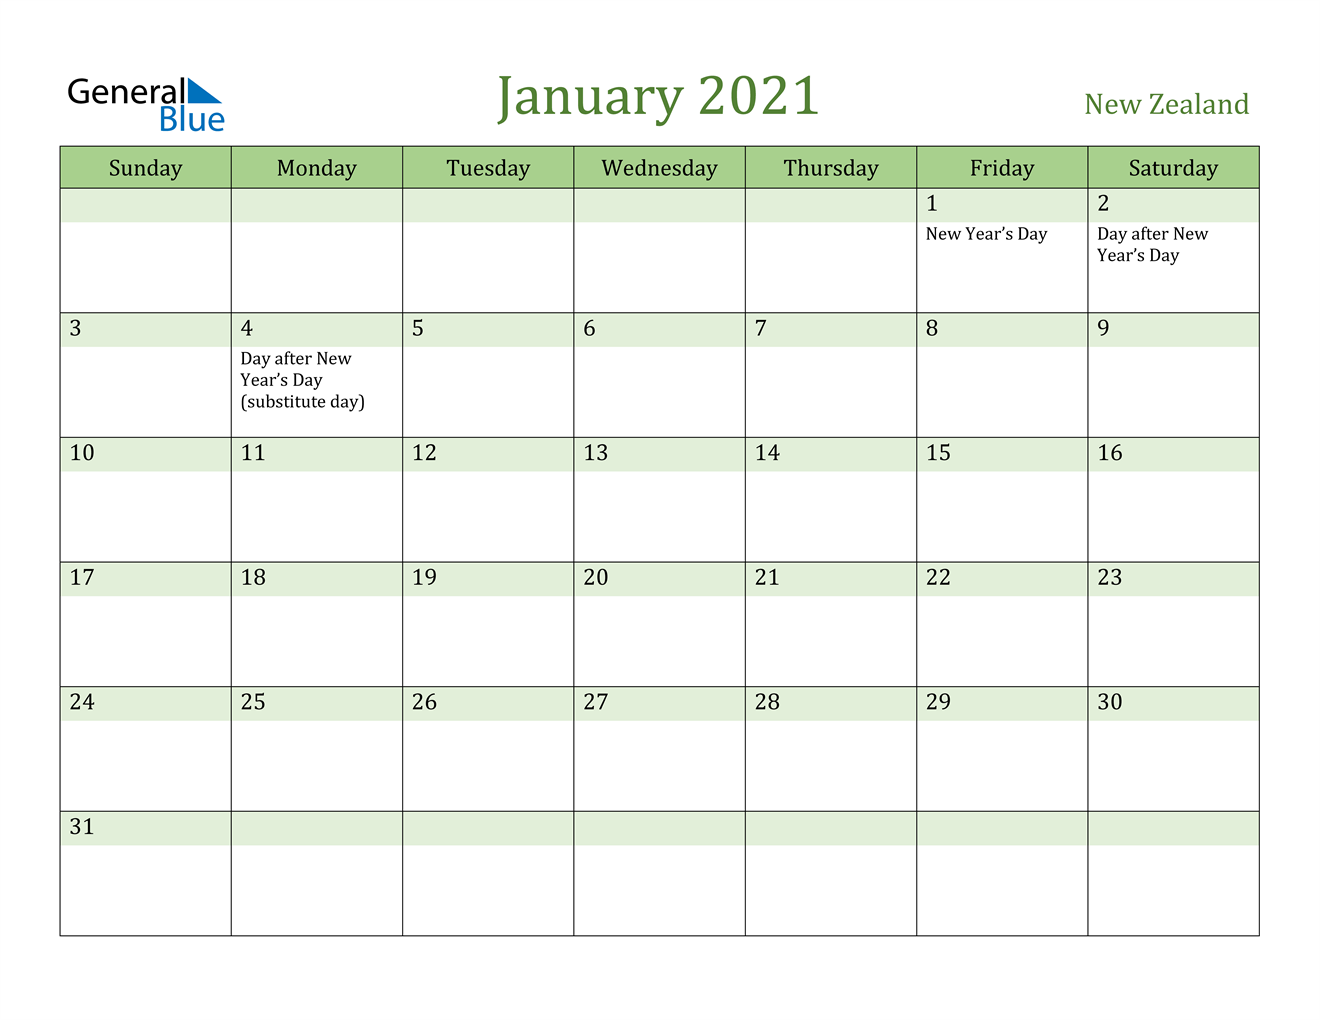 January 2021 Calendar - New Zealand